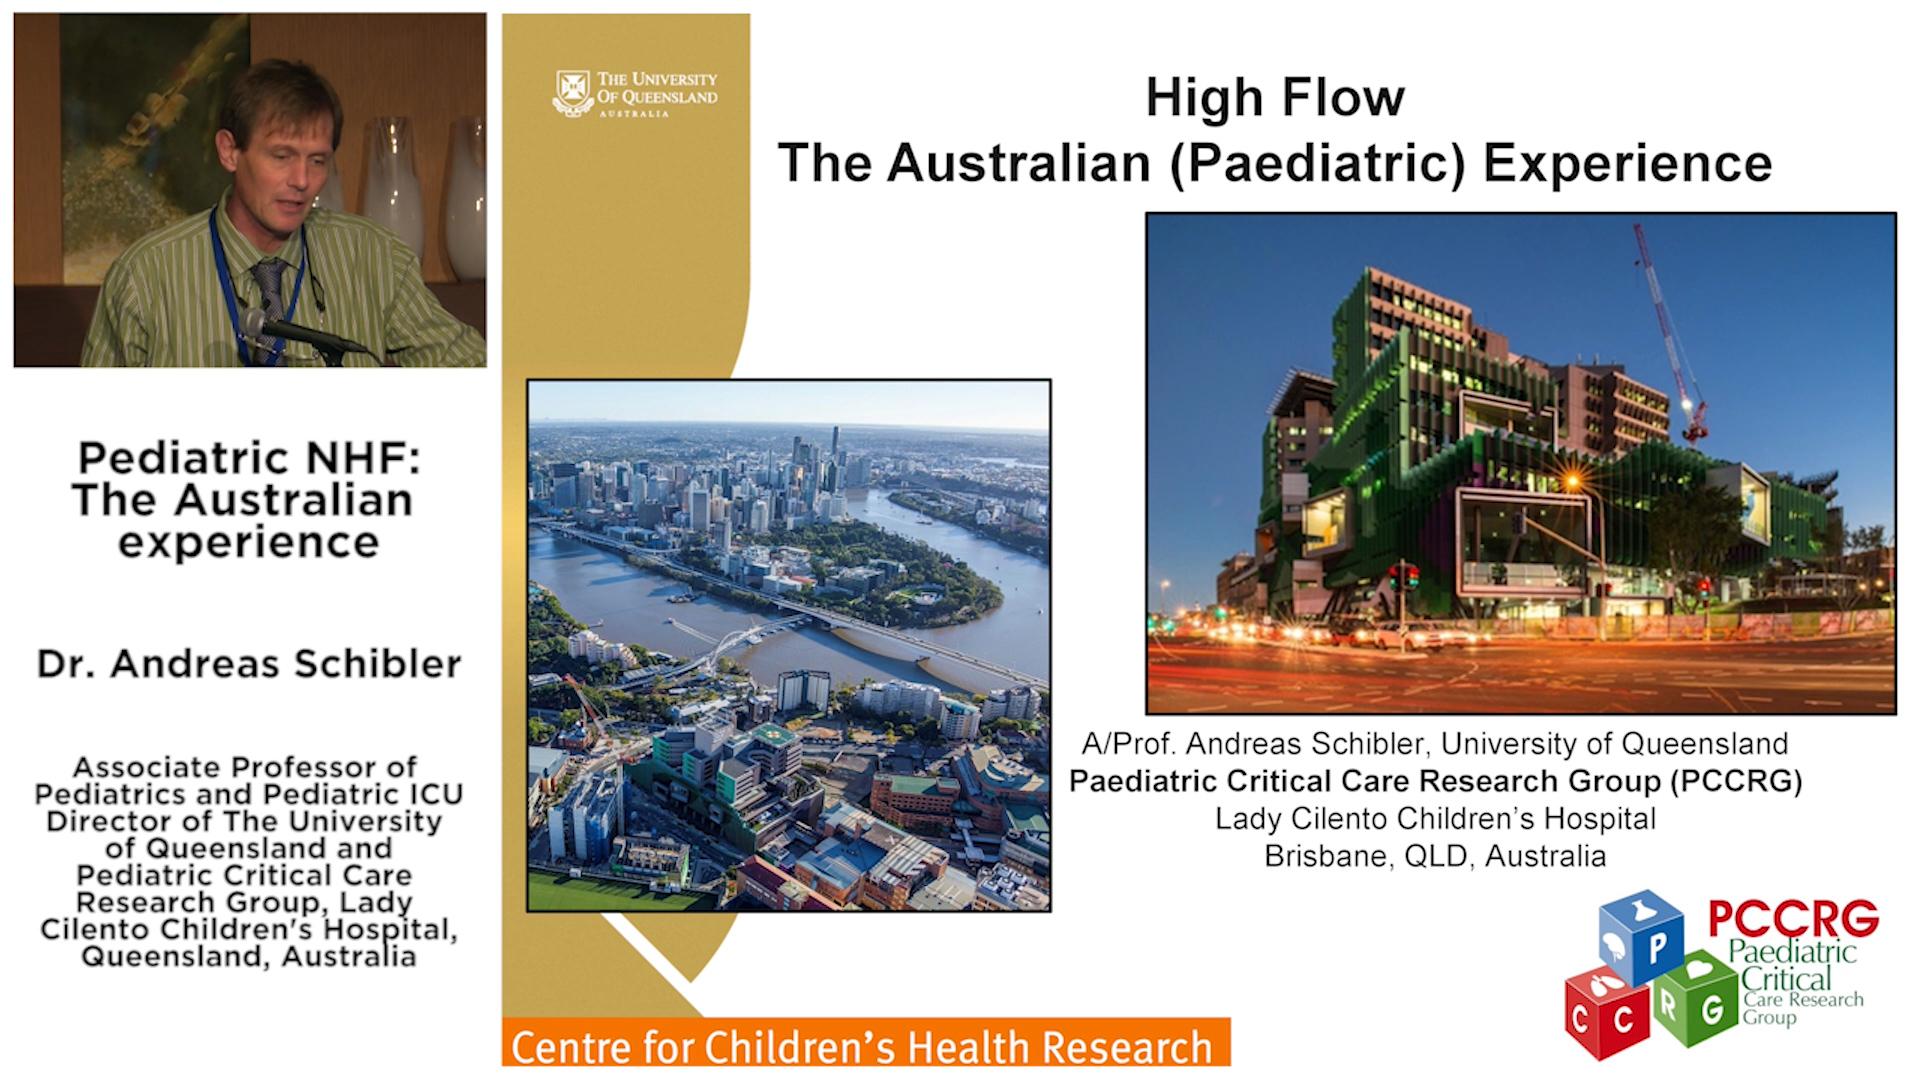 Pediatric NHF: The Australian experience - Dr Andreas Schibler